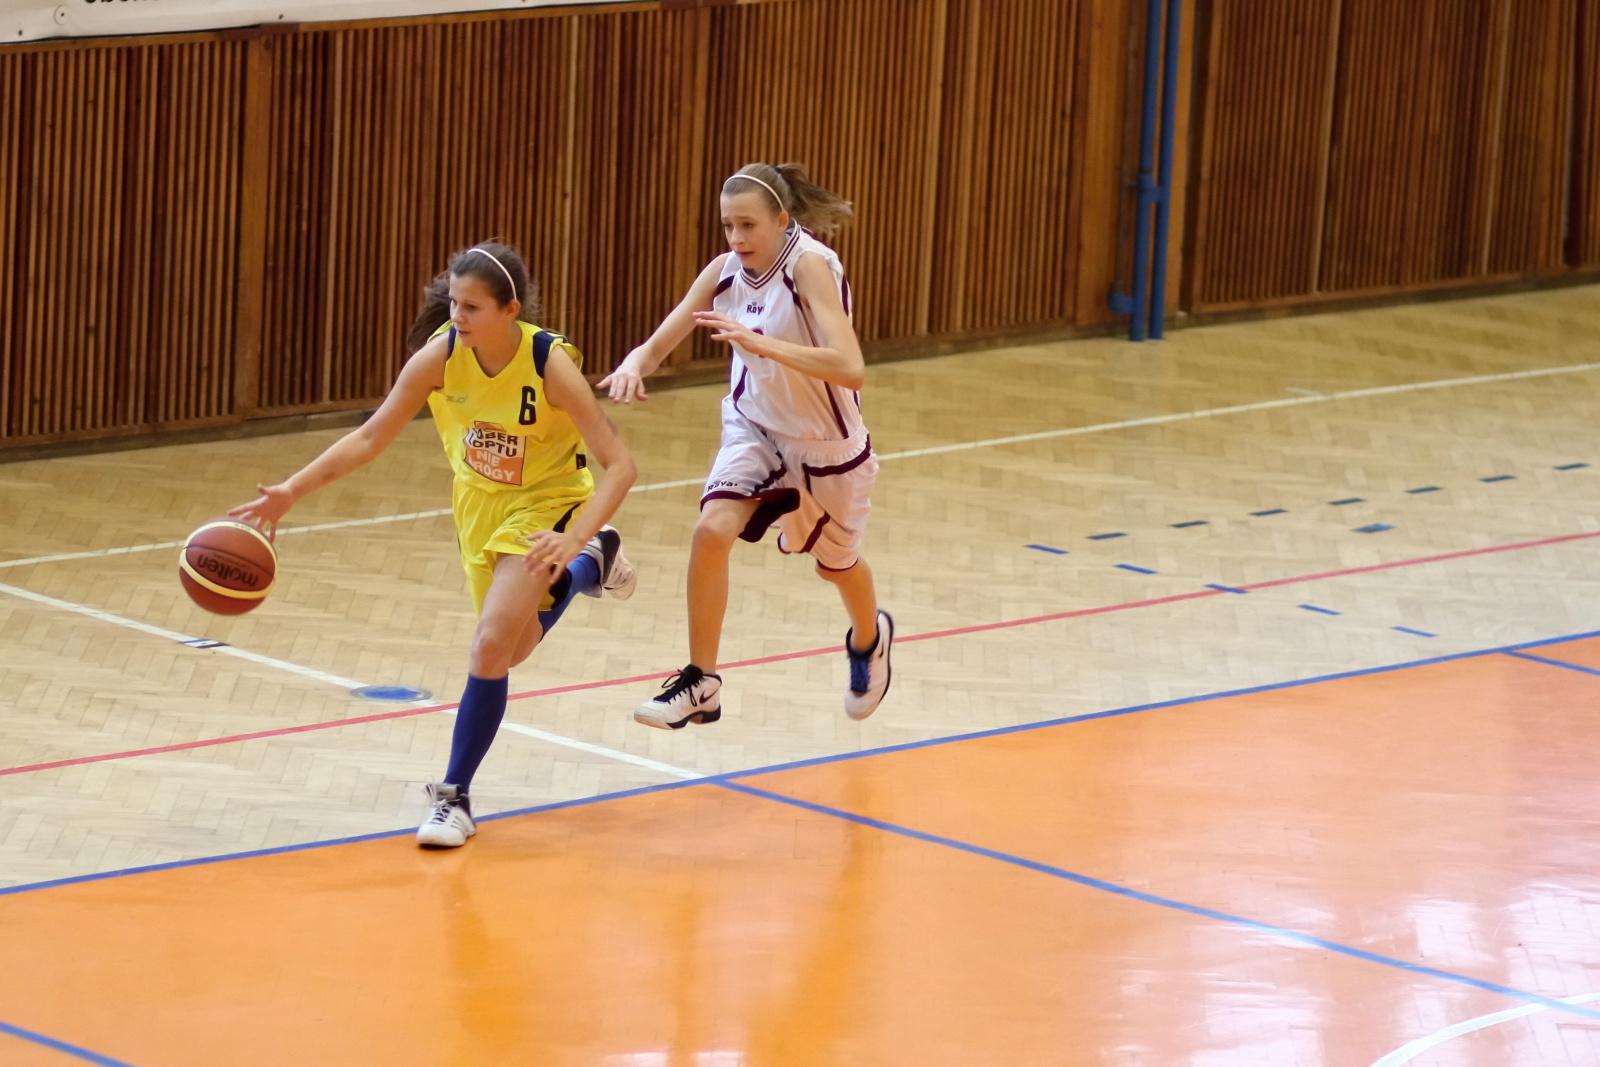 bk-zvolen-tydam-kosice-ziacky-basketbal-2011-6